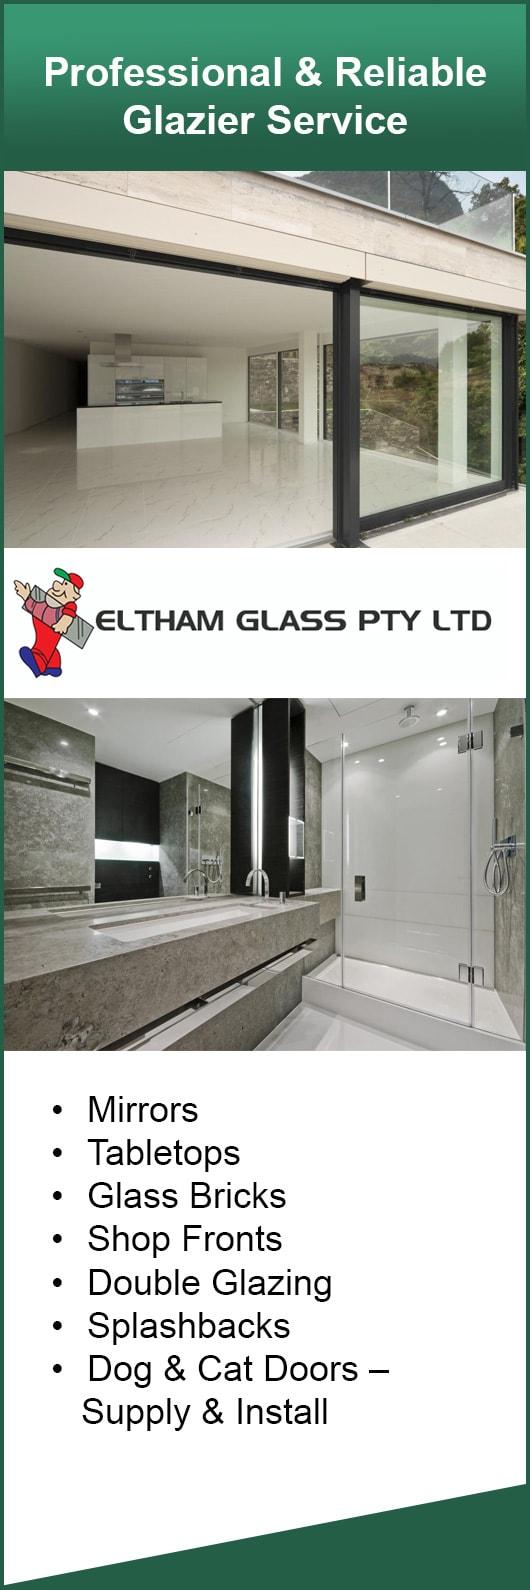 Eltham Glass Pty Ltd - Glazier & Glass Replacement Services - 49 ...